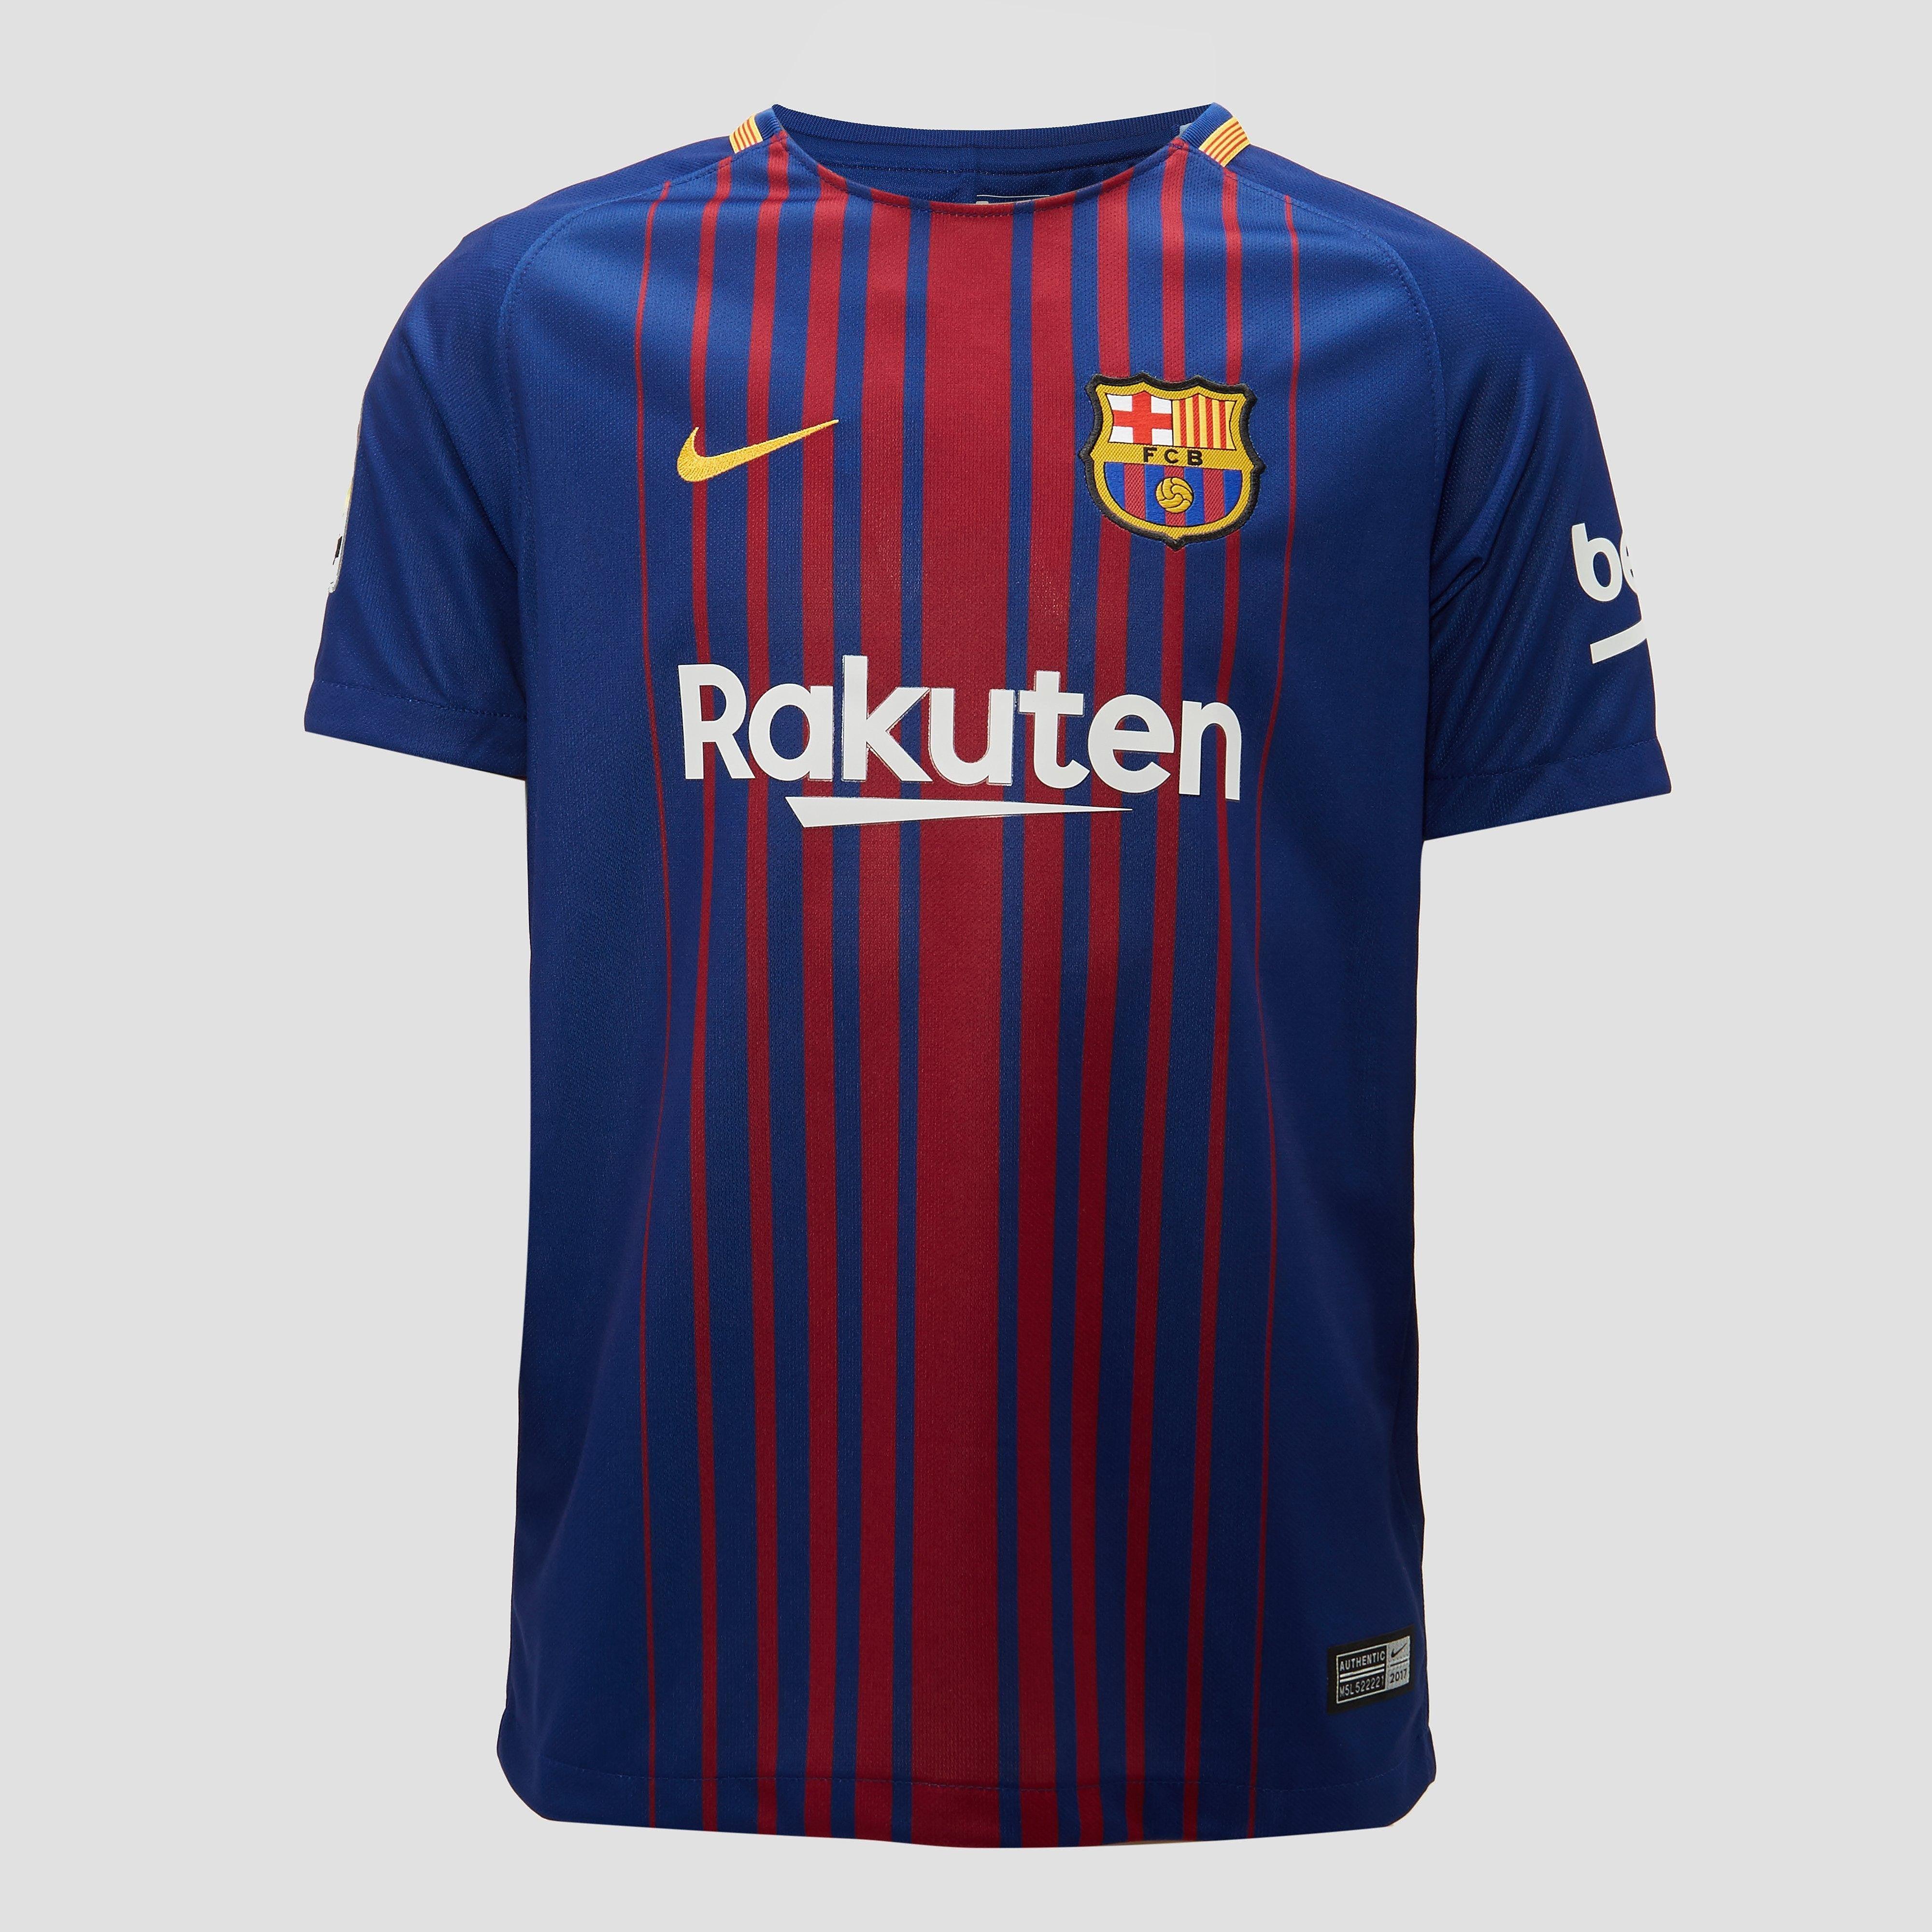 NIKE FC BARCELONA THUISSHIRT BLAUW/ROOD JONGENS